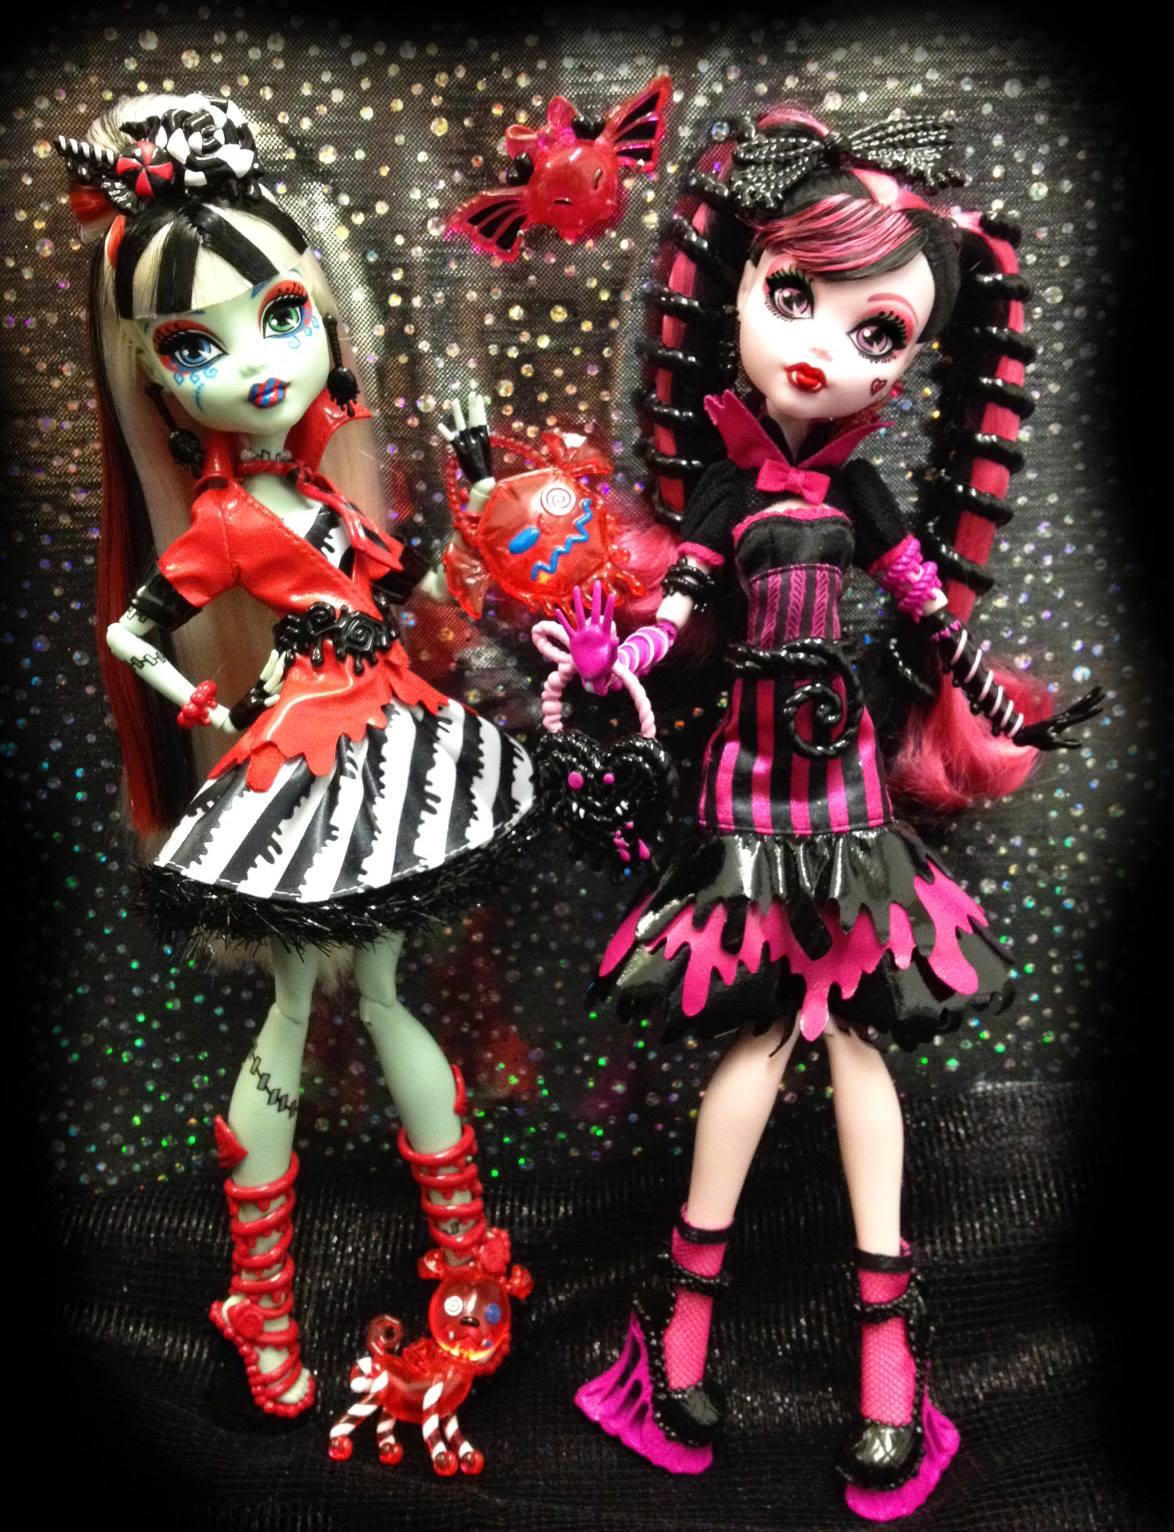 куклы монстр хай фото новые